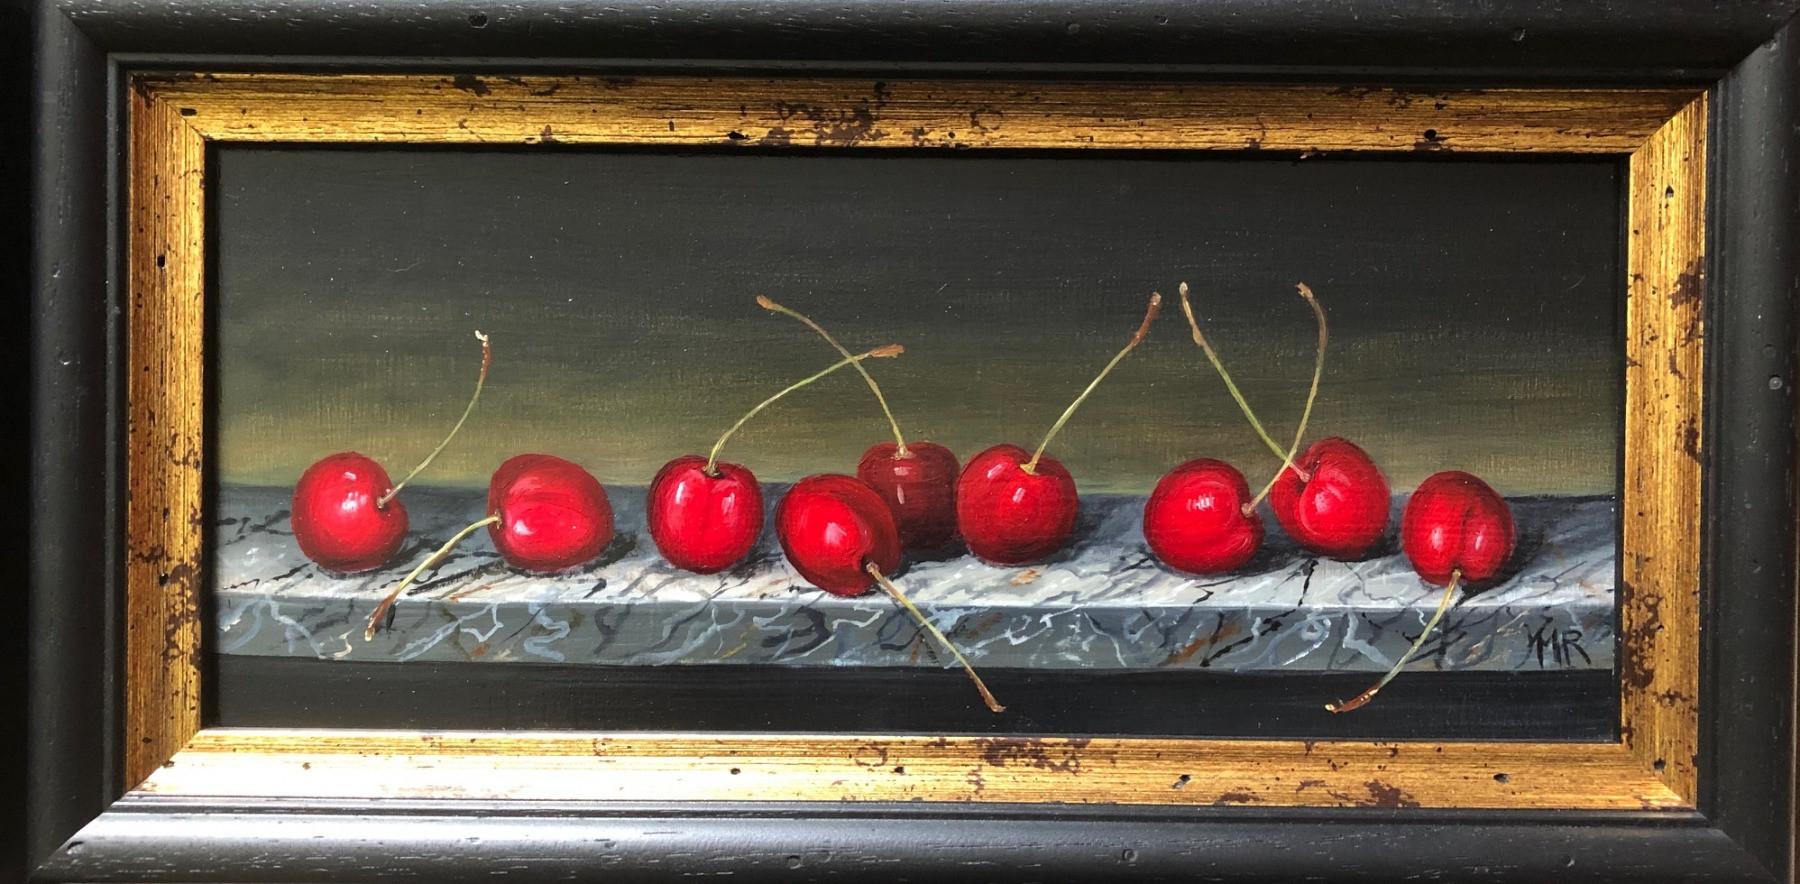 "MIMI ROBERTS   Cherries on a Top  OIL ON PANEL   18 x 36 cm   £485<br /><a class=""buy-button"" href=""mailto:info@dacre-art.com?subject=Website%20Enquiry"">Enquire</a>"